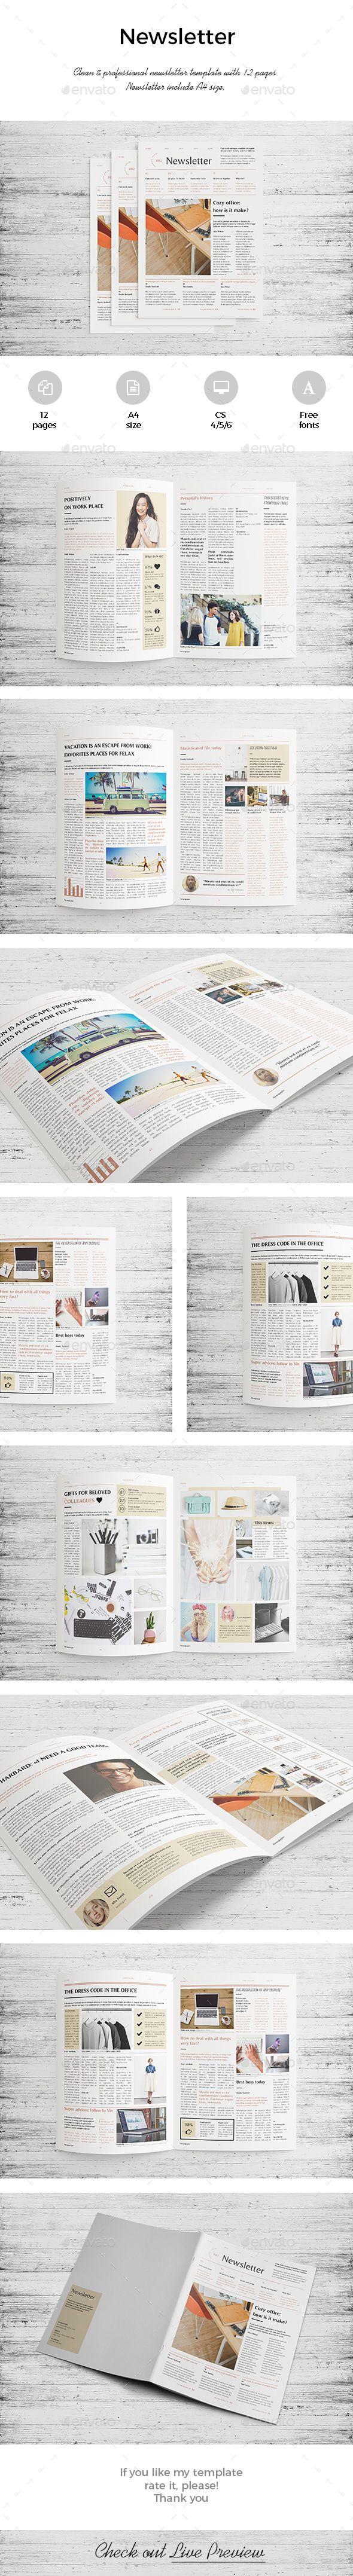 Newsletter Corporate 12 Pages | Revistas, Diario y Modelo